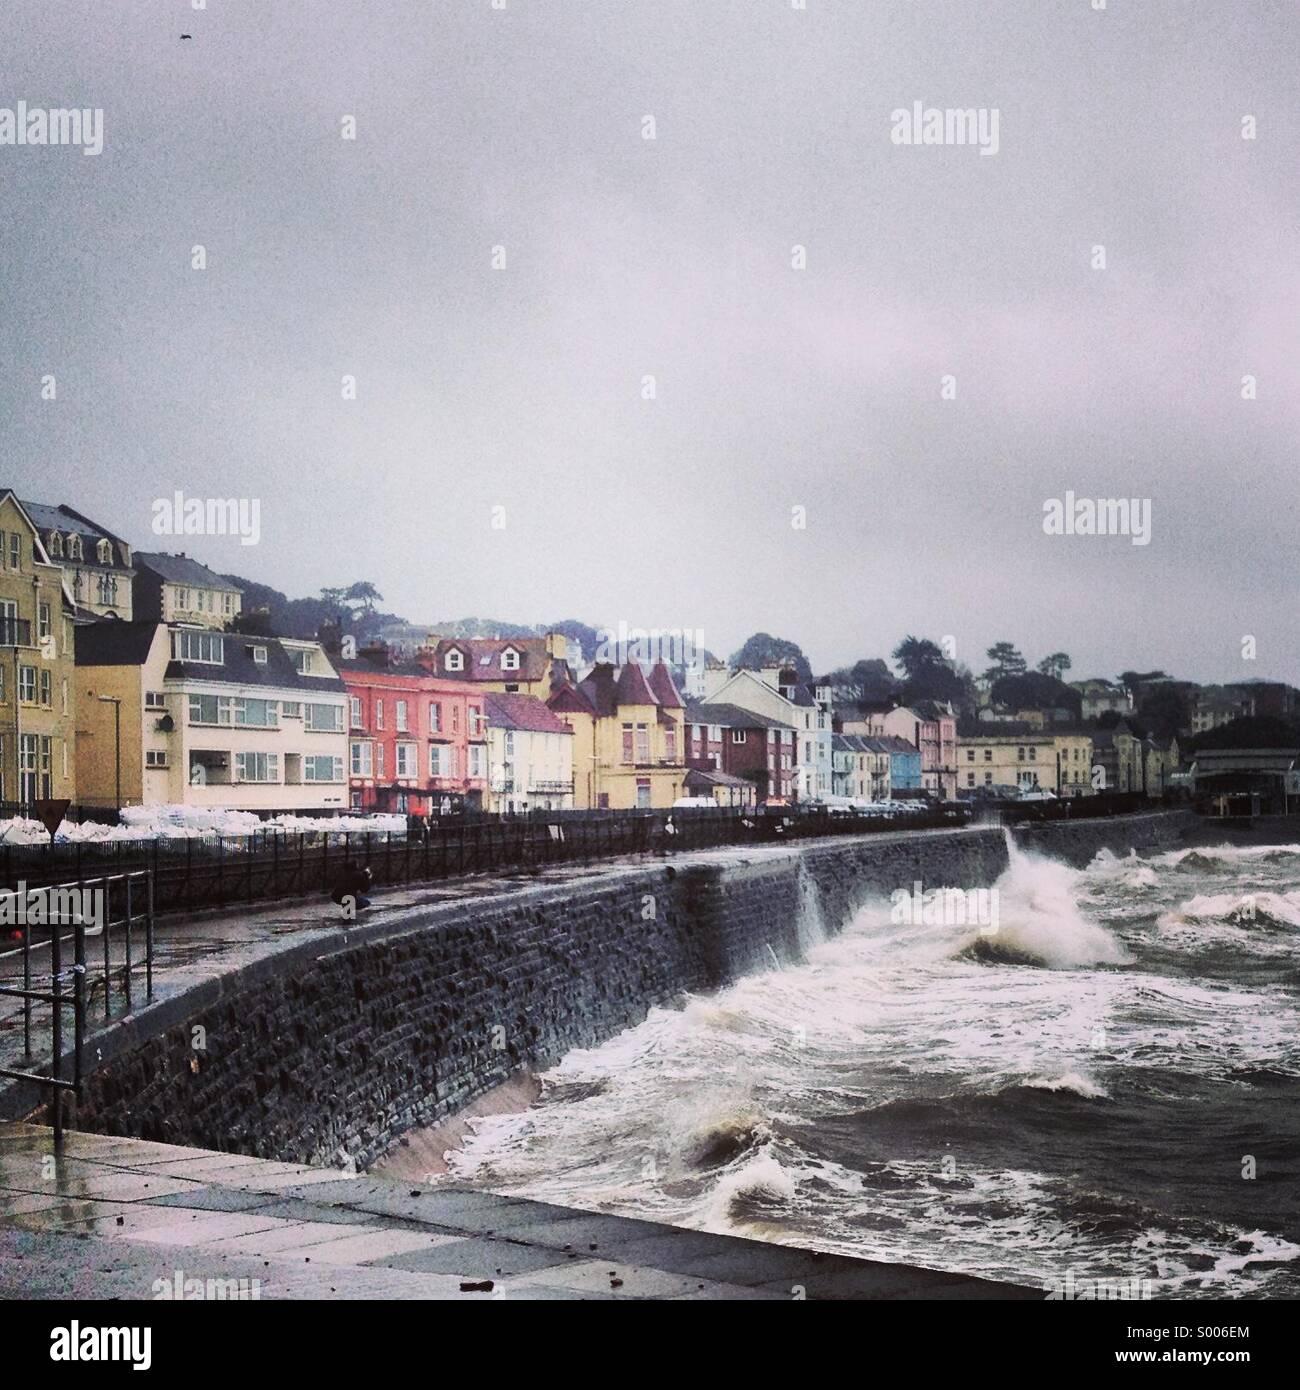 Uk storms - Stock Image